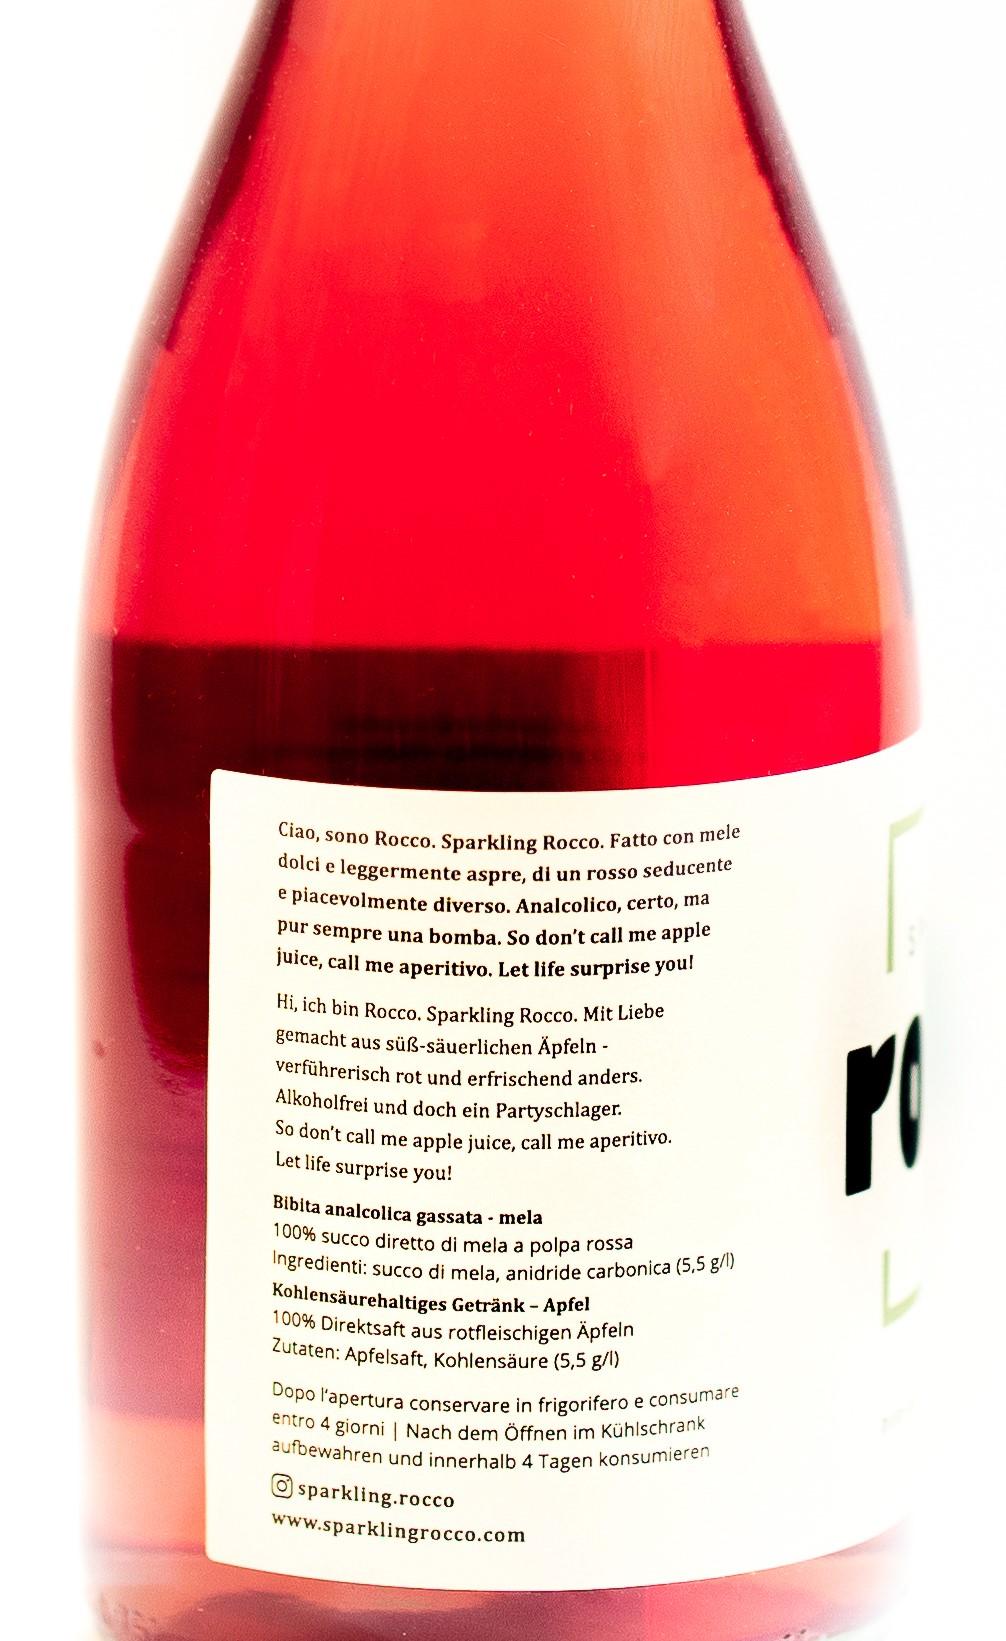 Sparkling Rocco - Alkoholfreier Aperitif